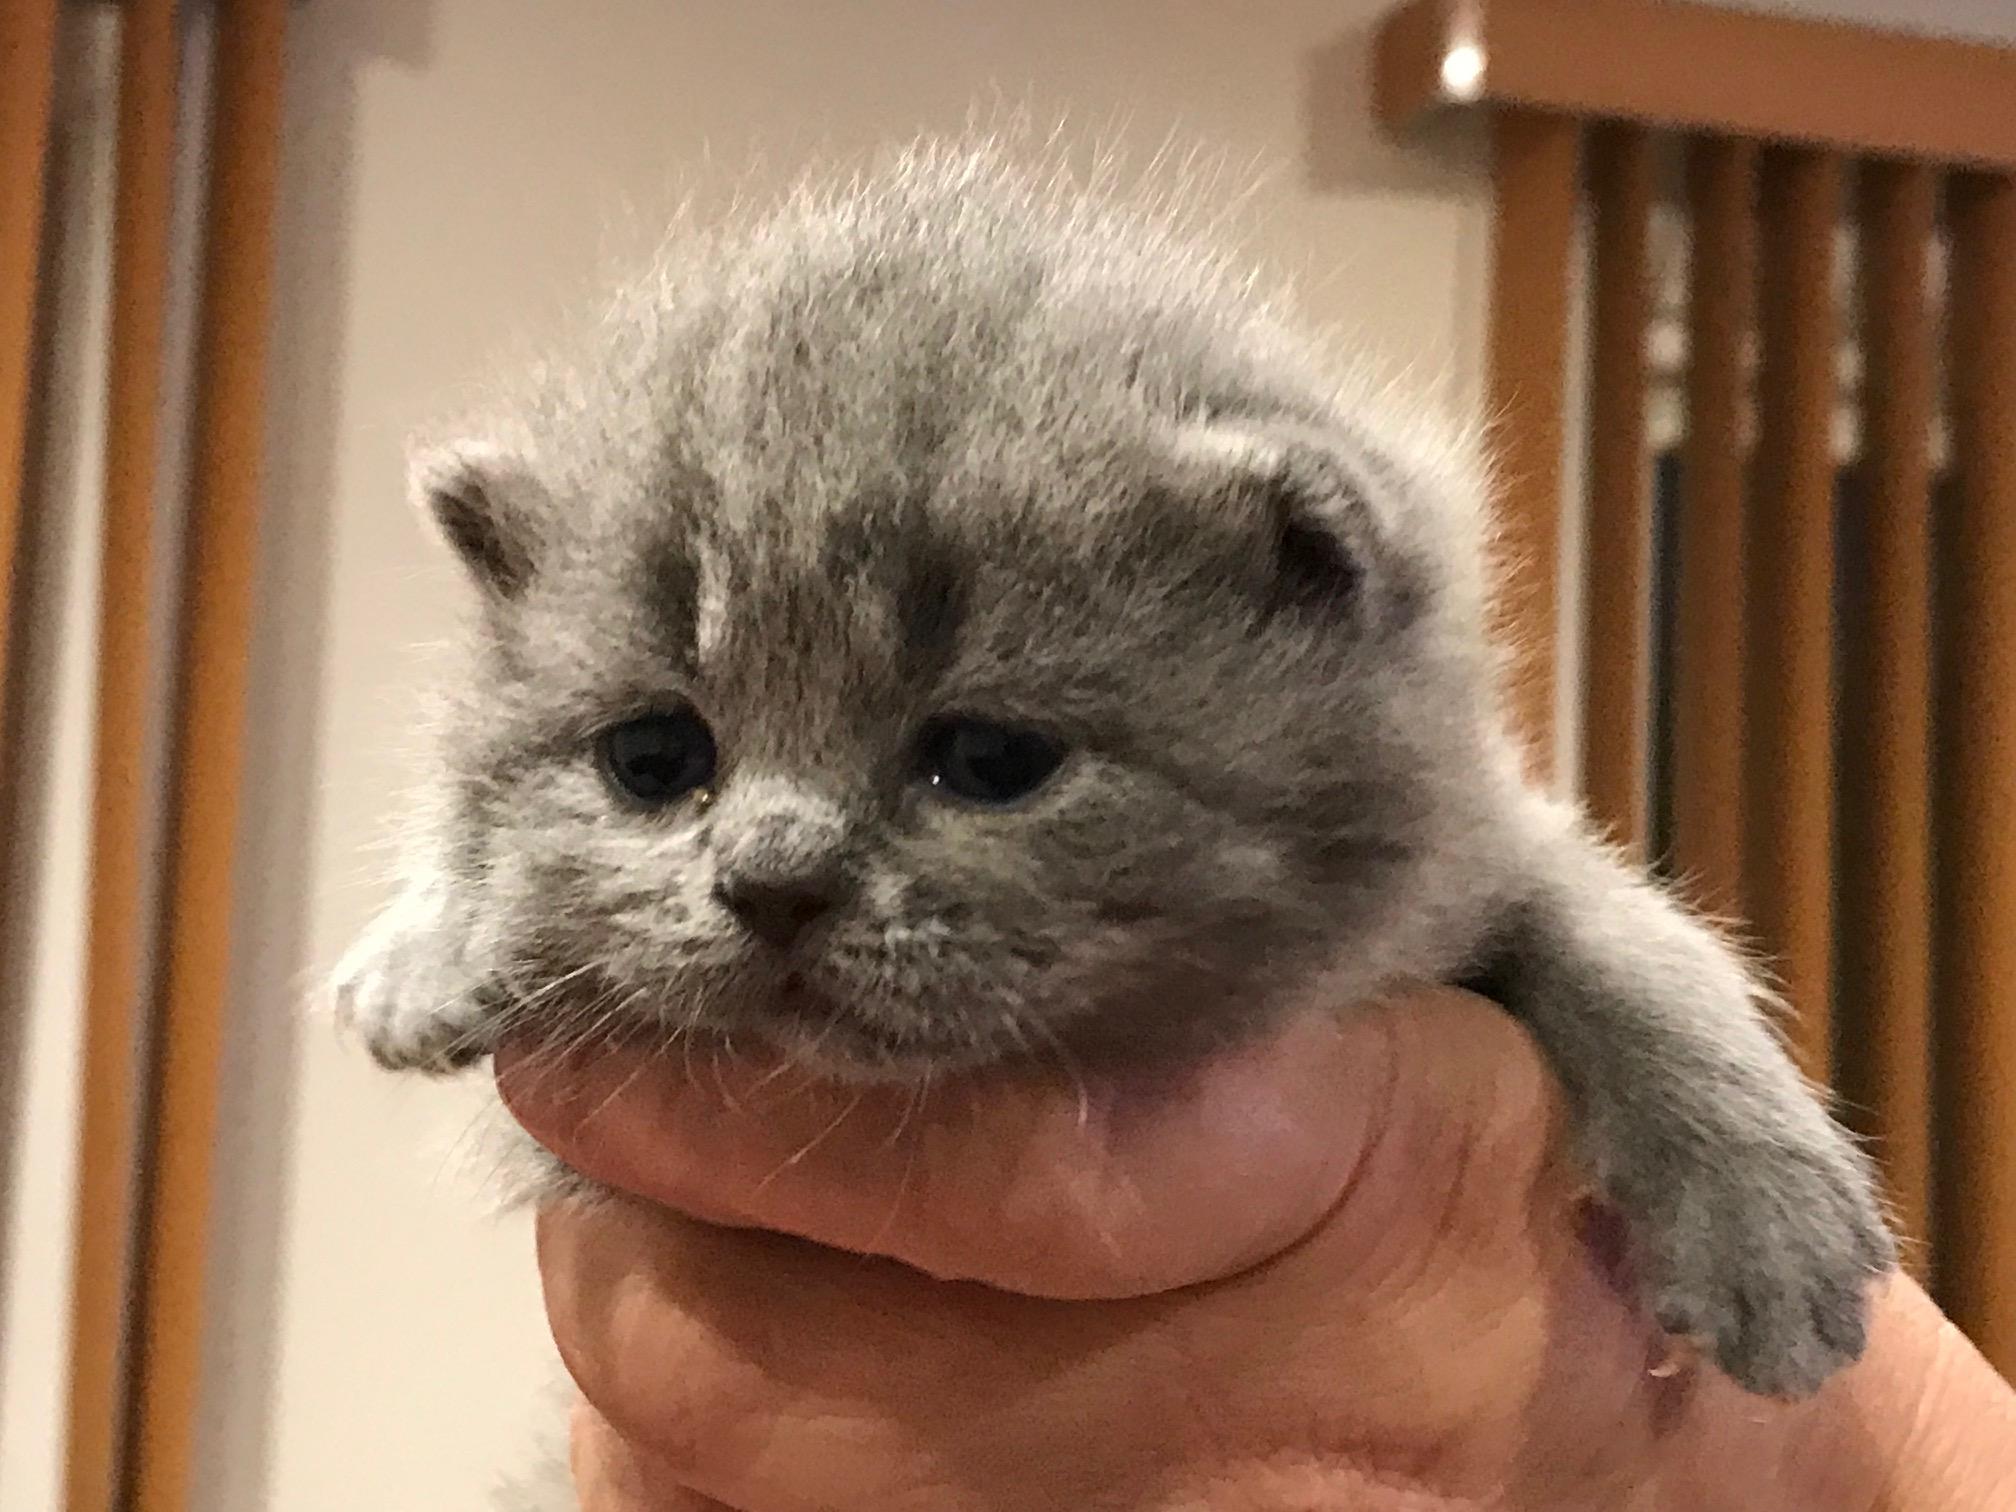 Ogłoszenie darmowe. Lokalizacja:  Philadelphia PA. BUY / SELL - Pets. For Sale Scottish Fold/Straight Kittens!!!.